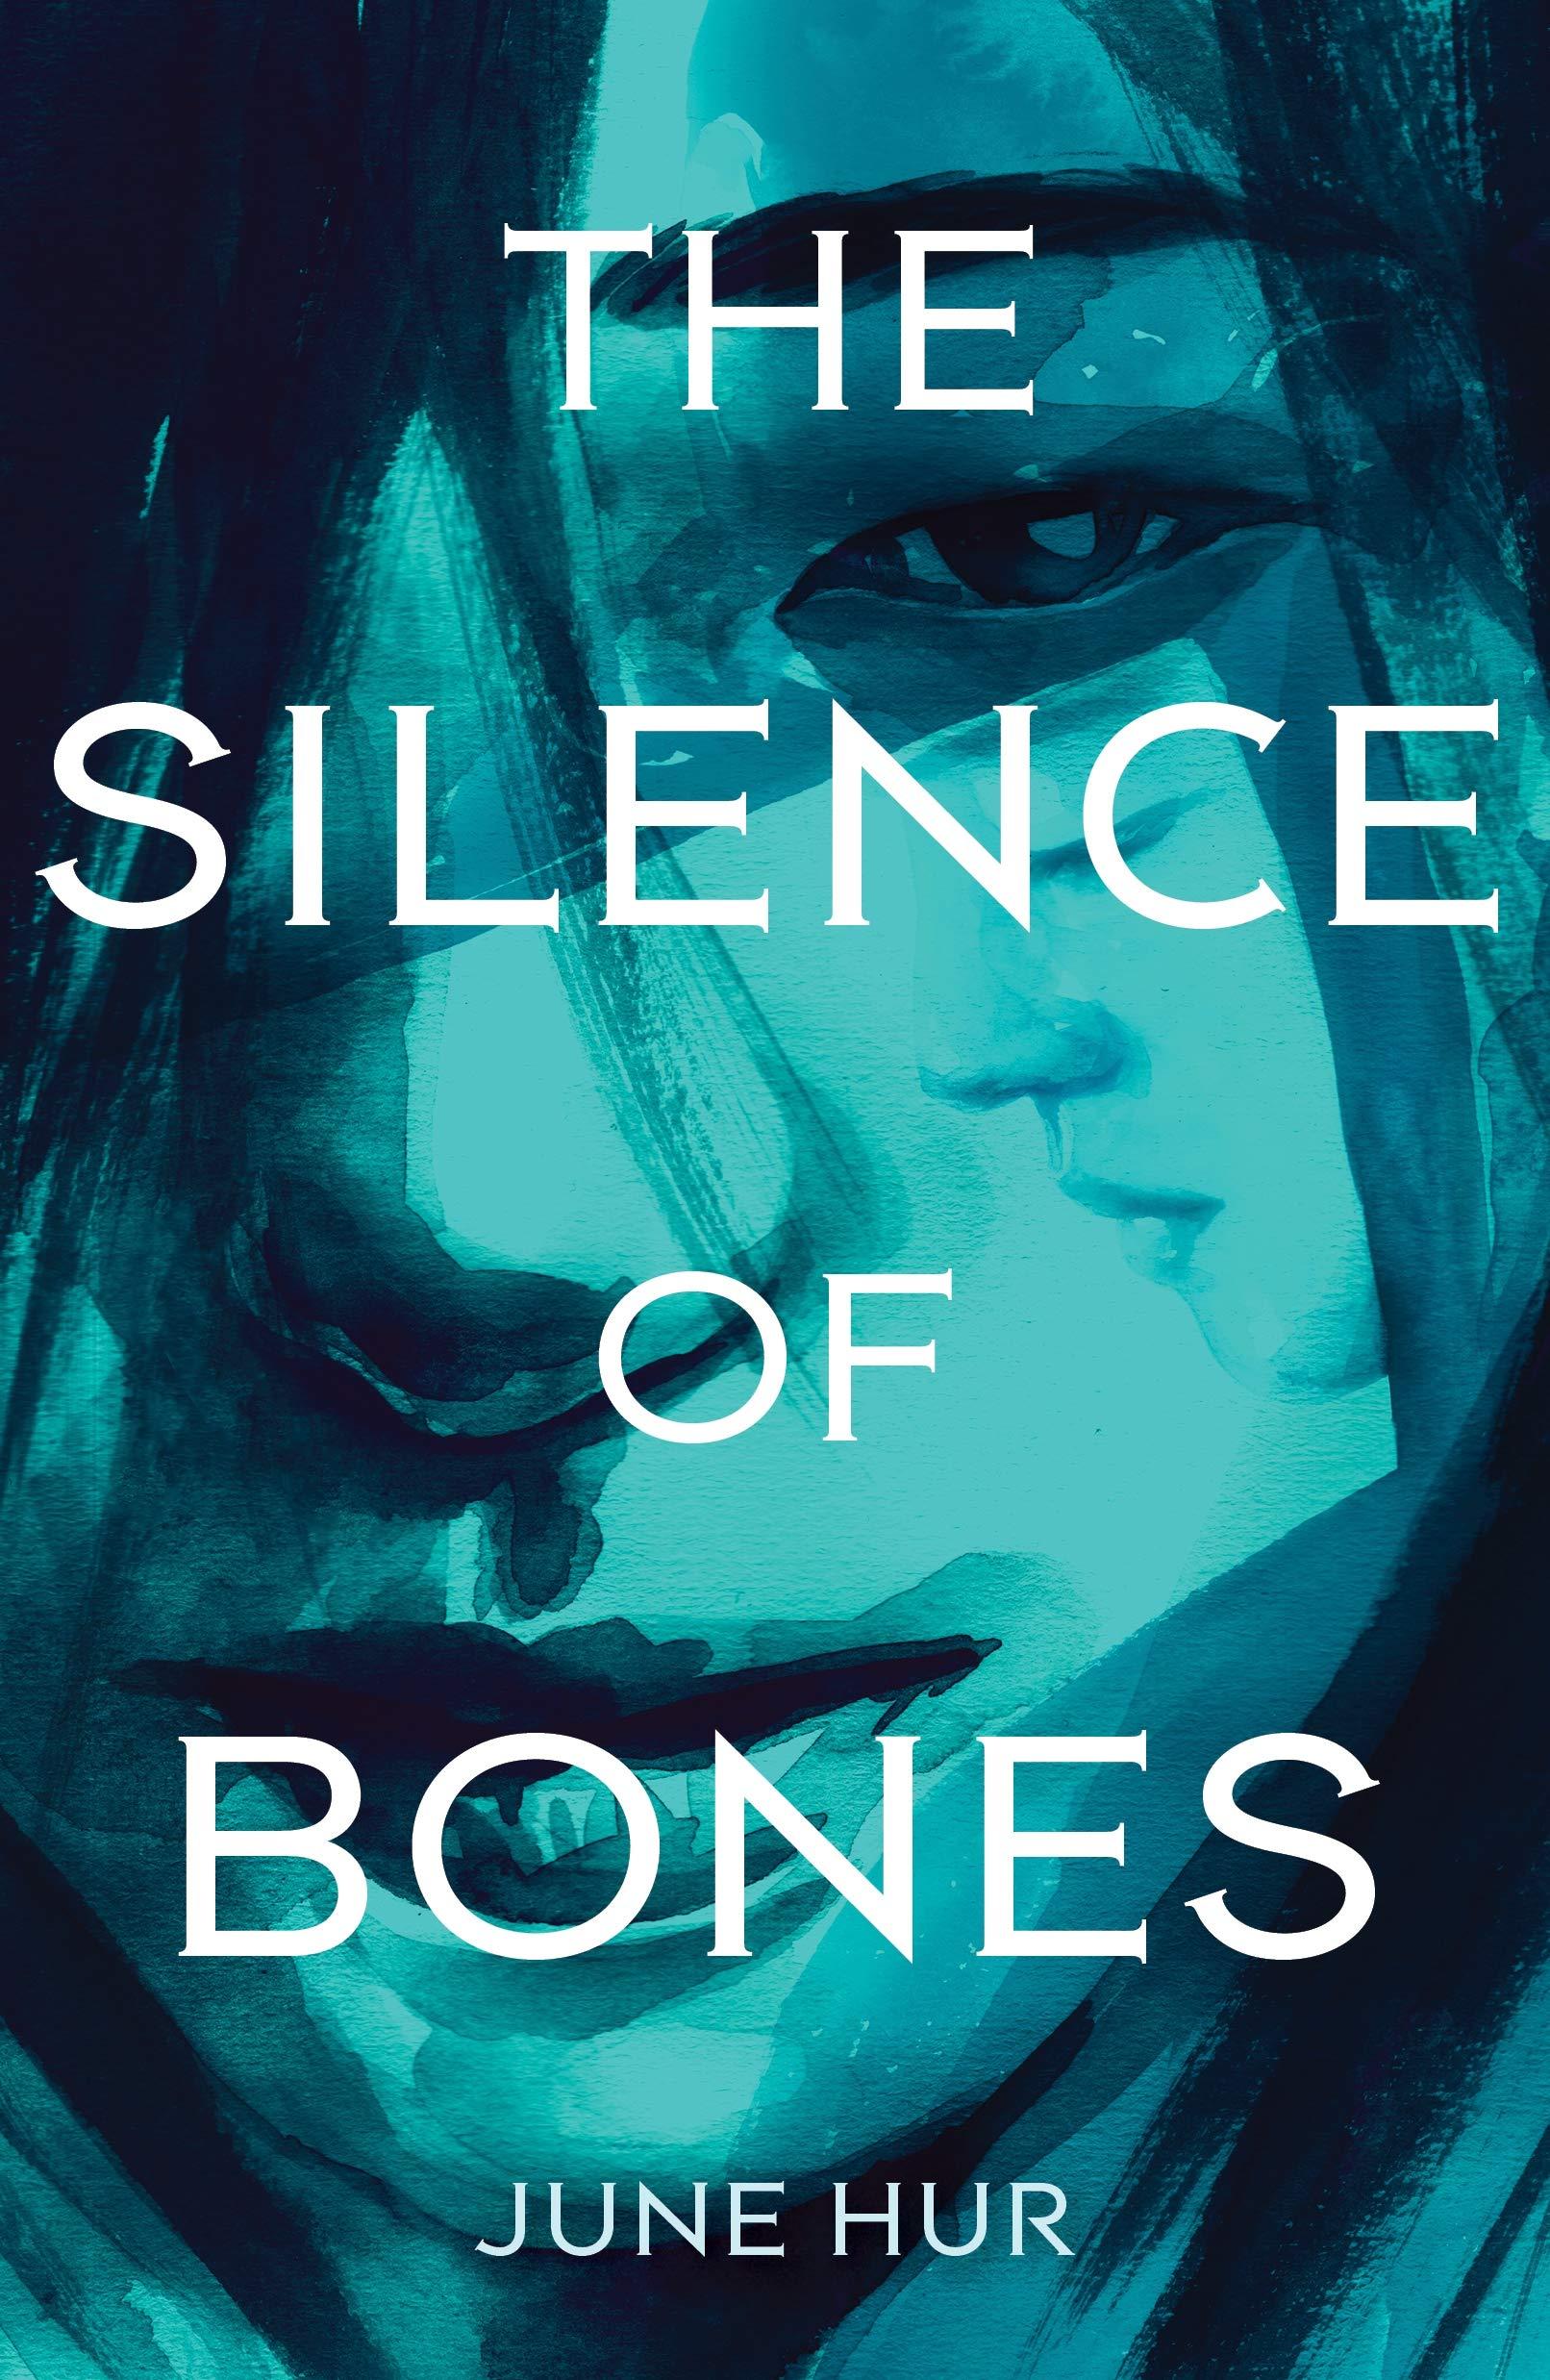 Amazon.com: The Silence of Bones (9781250229557): June Hur: Books